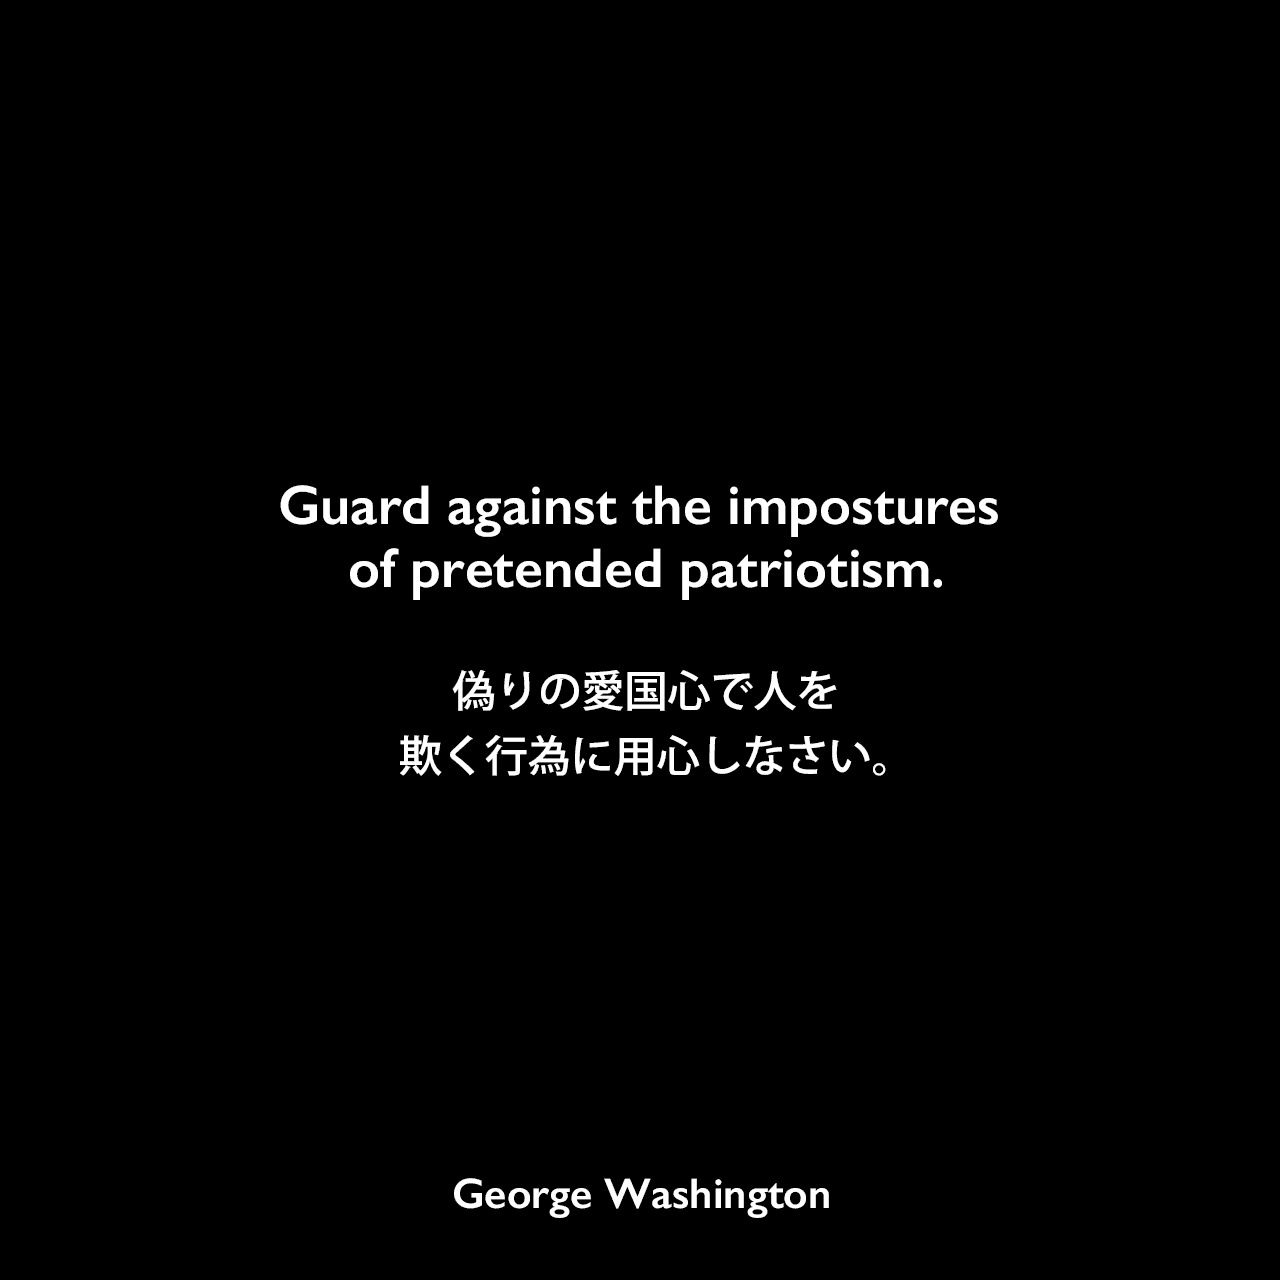 Guard against the impostures of pretended patriotism.偽りの愛国心で人を欺く行為に用心しなさい。- 1796年の初代大統領退任挨拶よりGeorge Washington